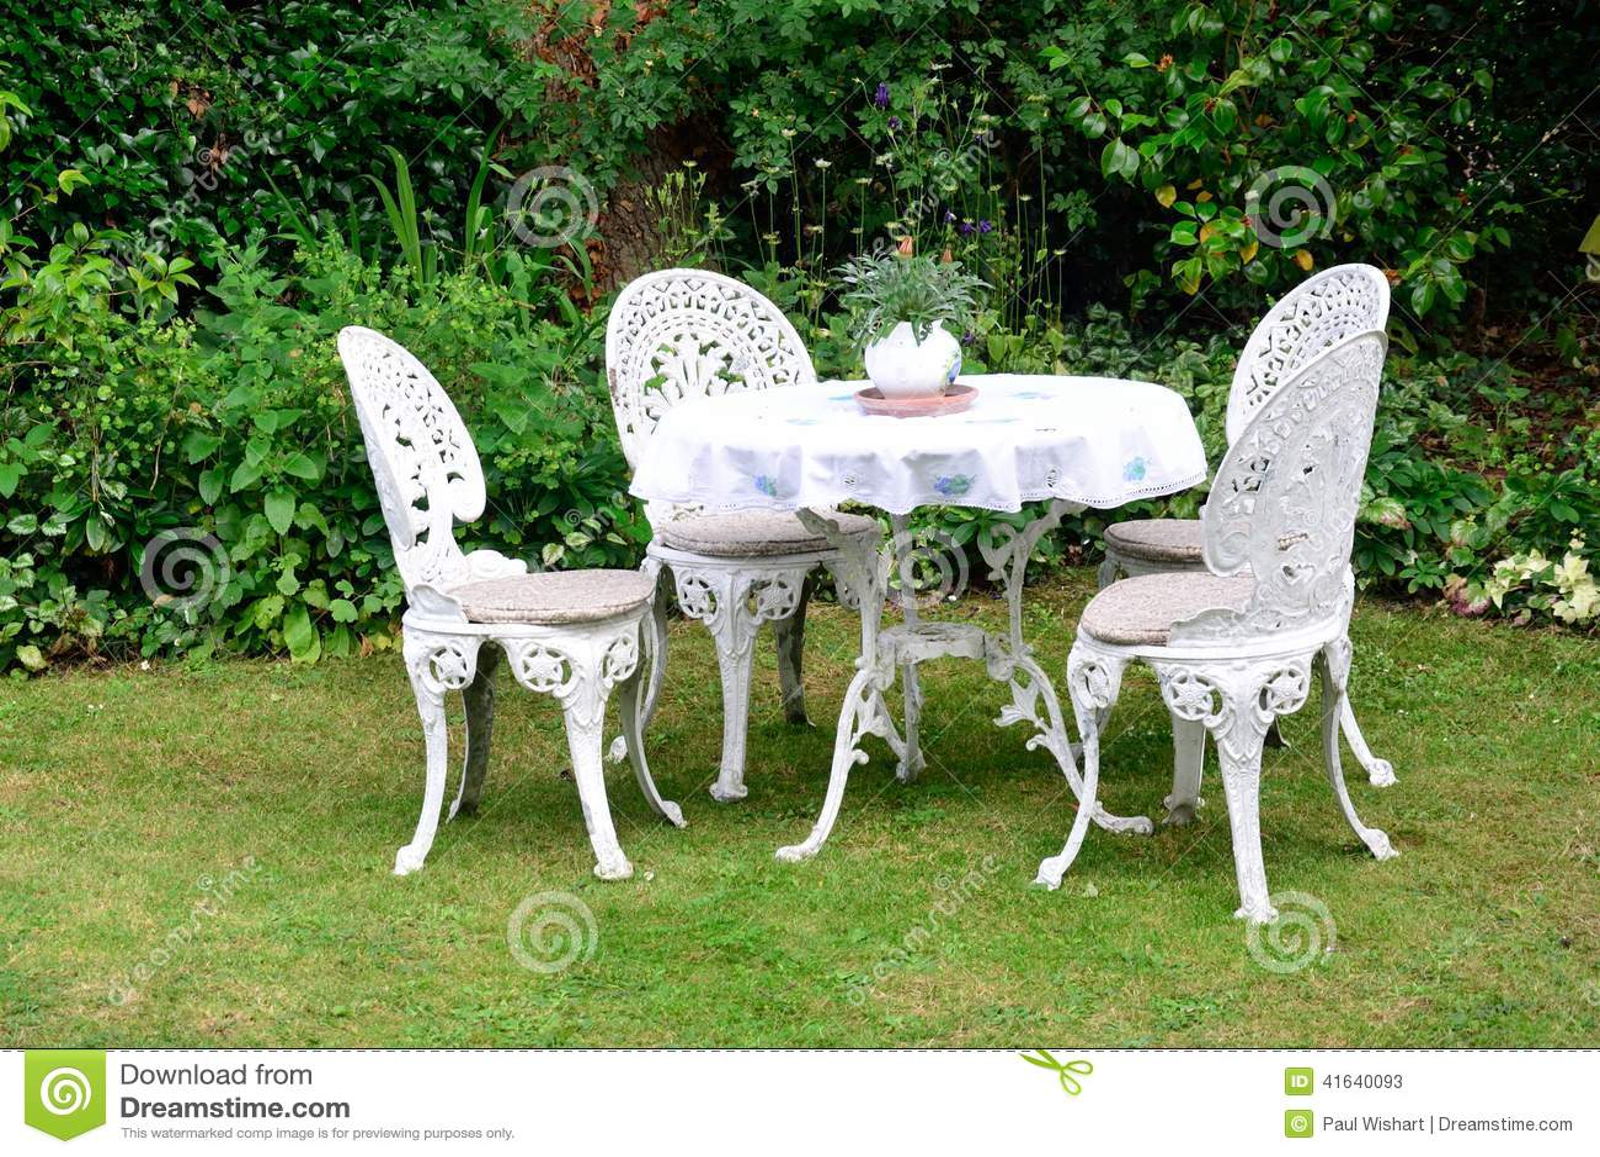 Sedie In Ghisa Da Giardino Prezzi.Sedie Di Giardino Del Ghisa Immagine Stock Immagine Di Presidenza